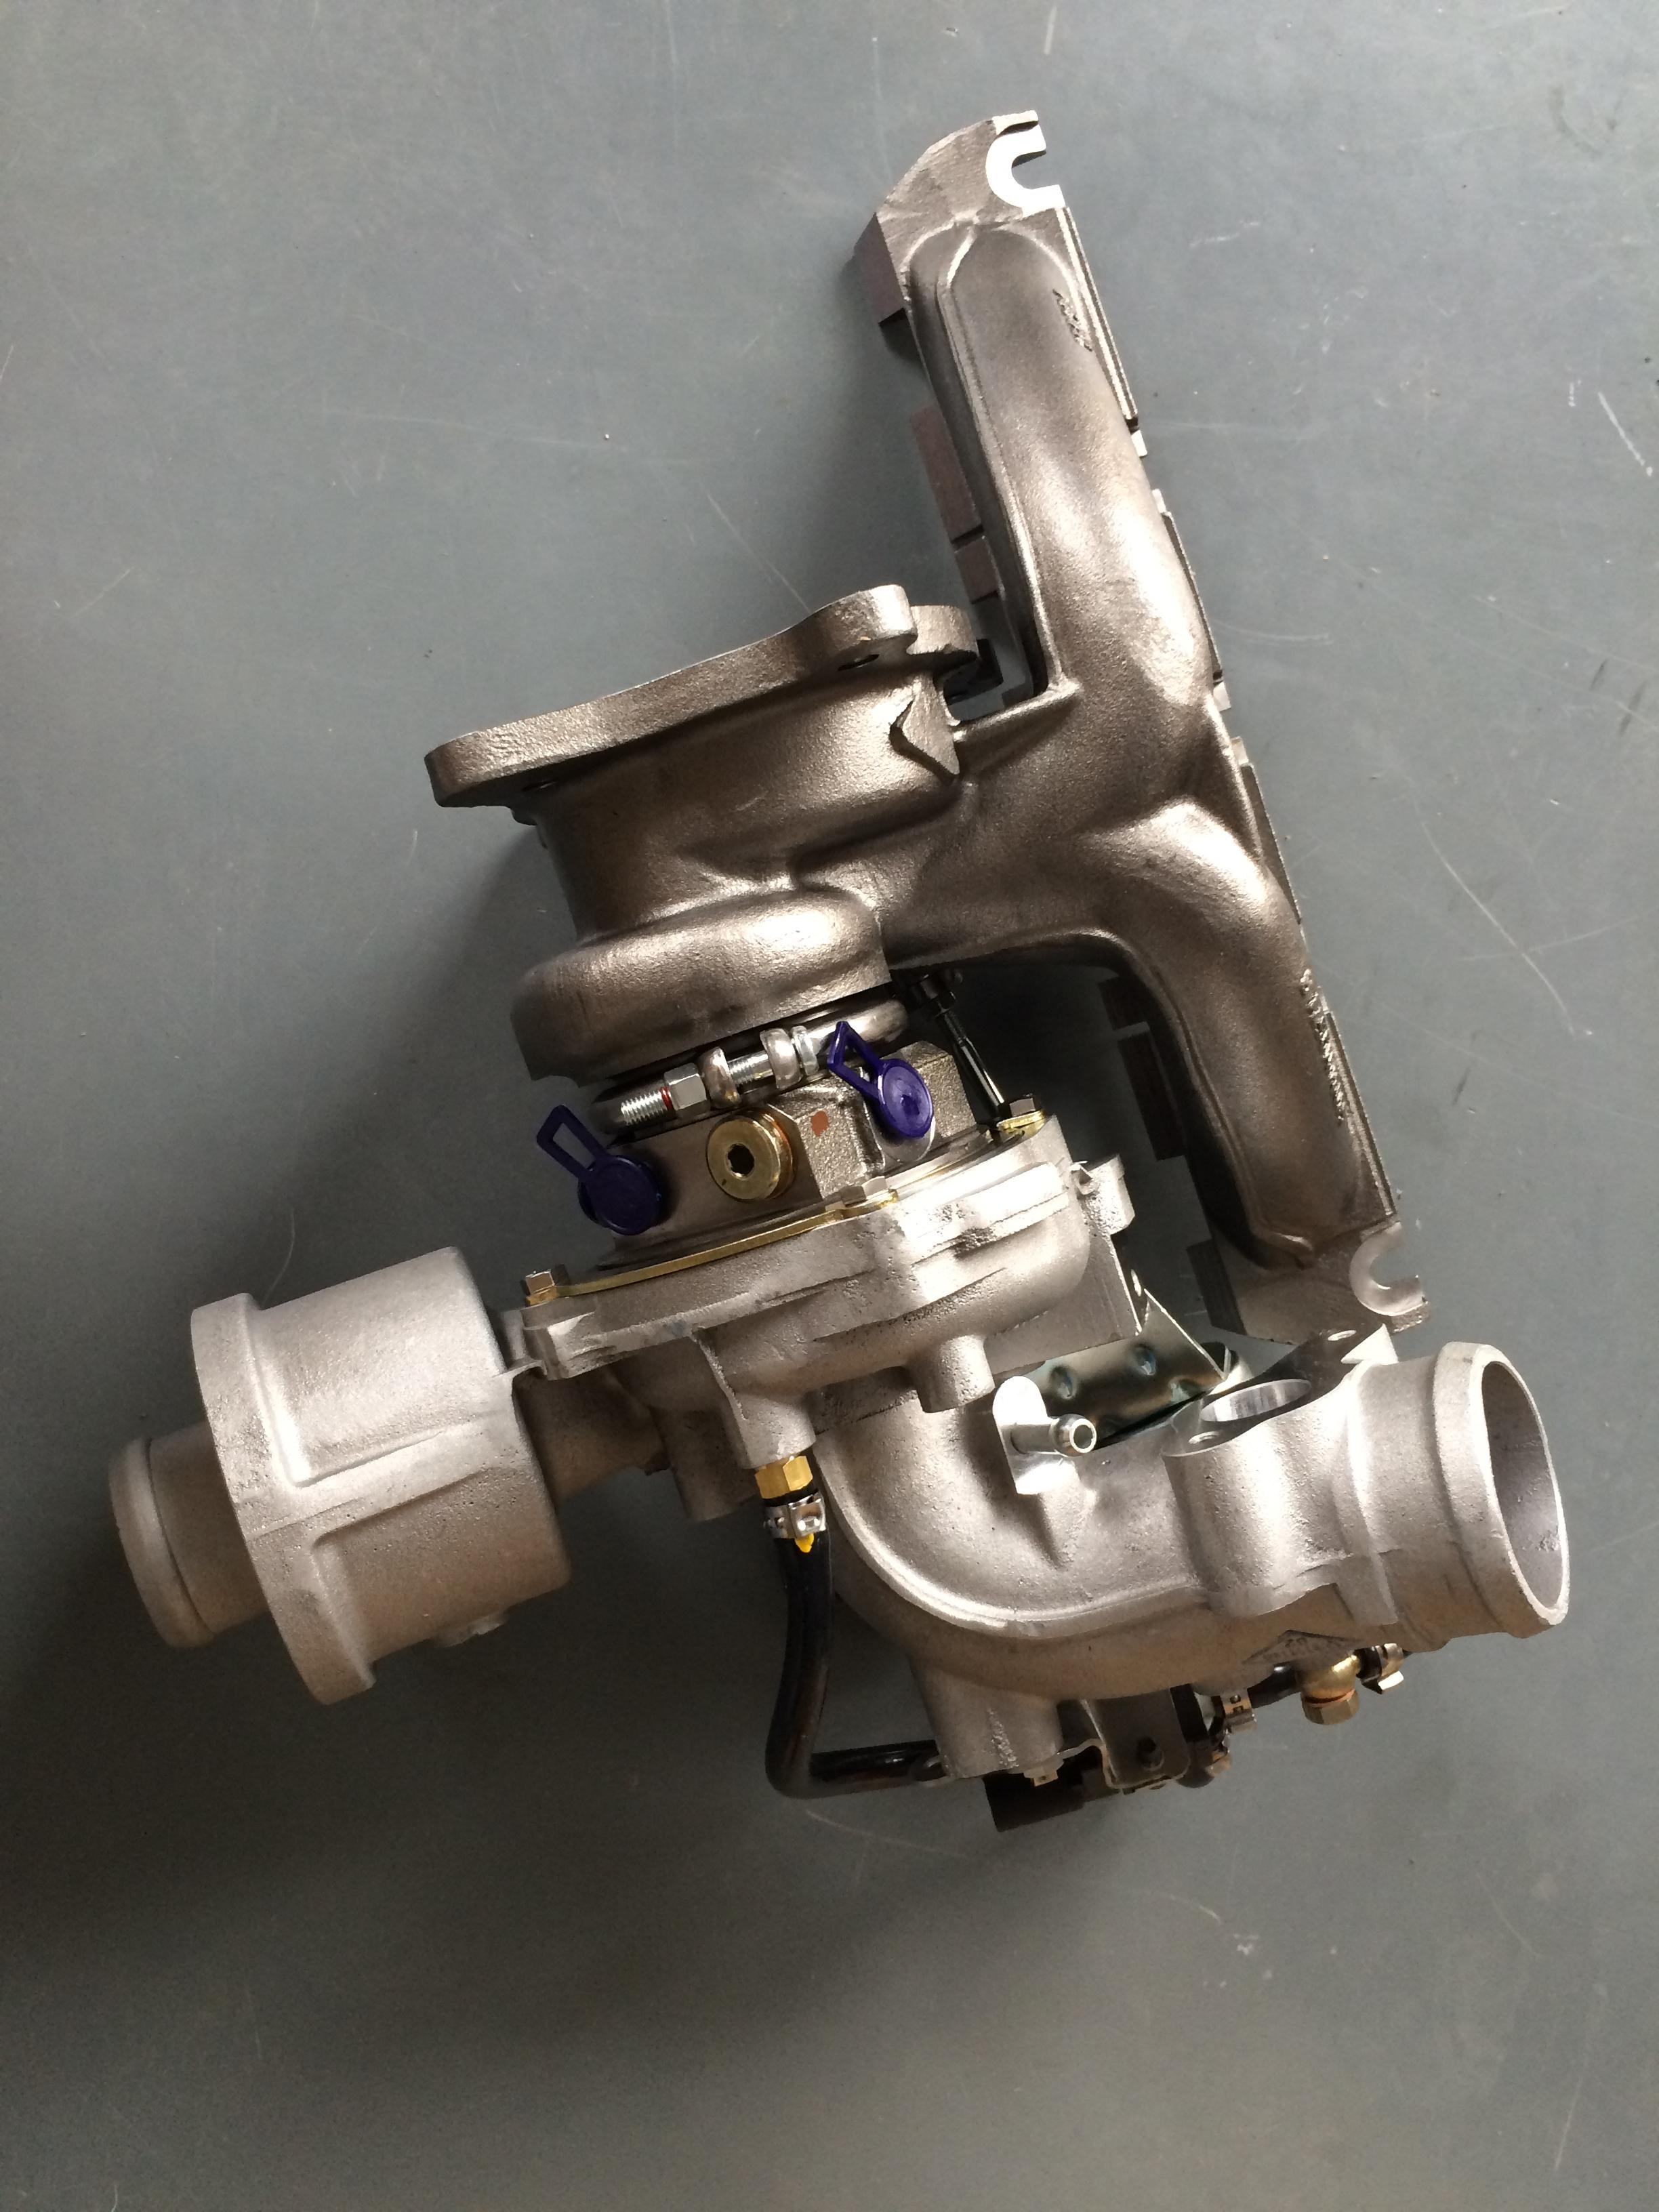 K03 Turbo for Volkswagen Tiguan Magotan TFSI 06J145702G 53039700159 53039880159 53039700106